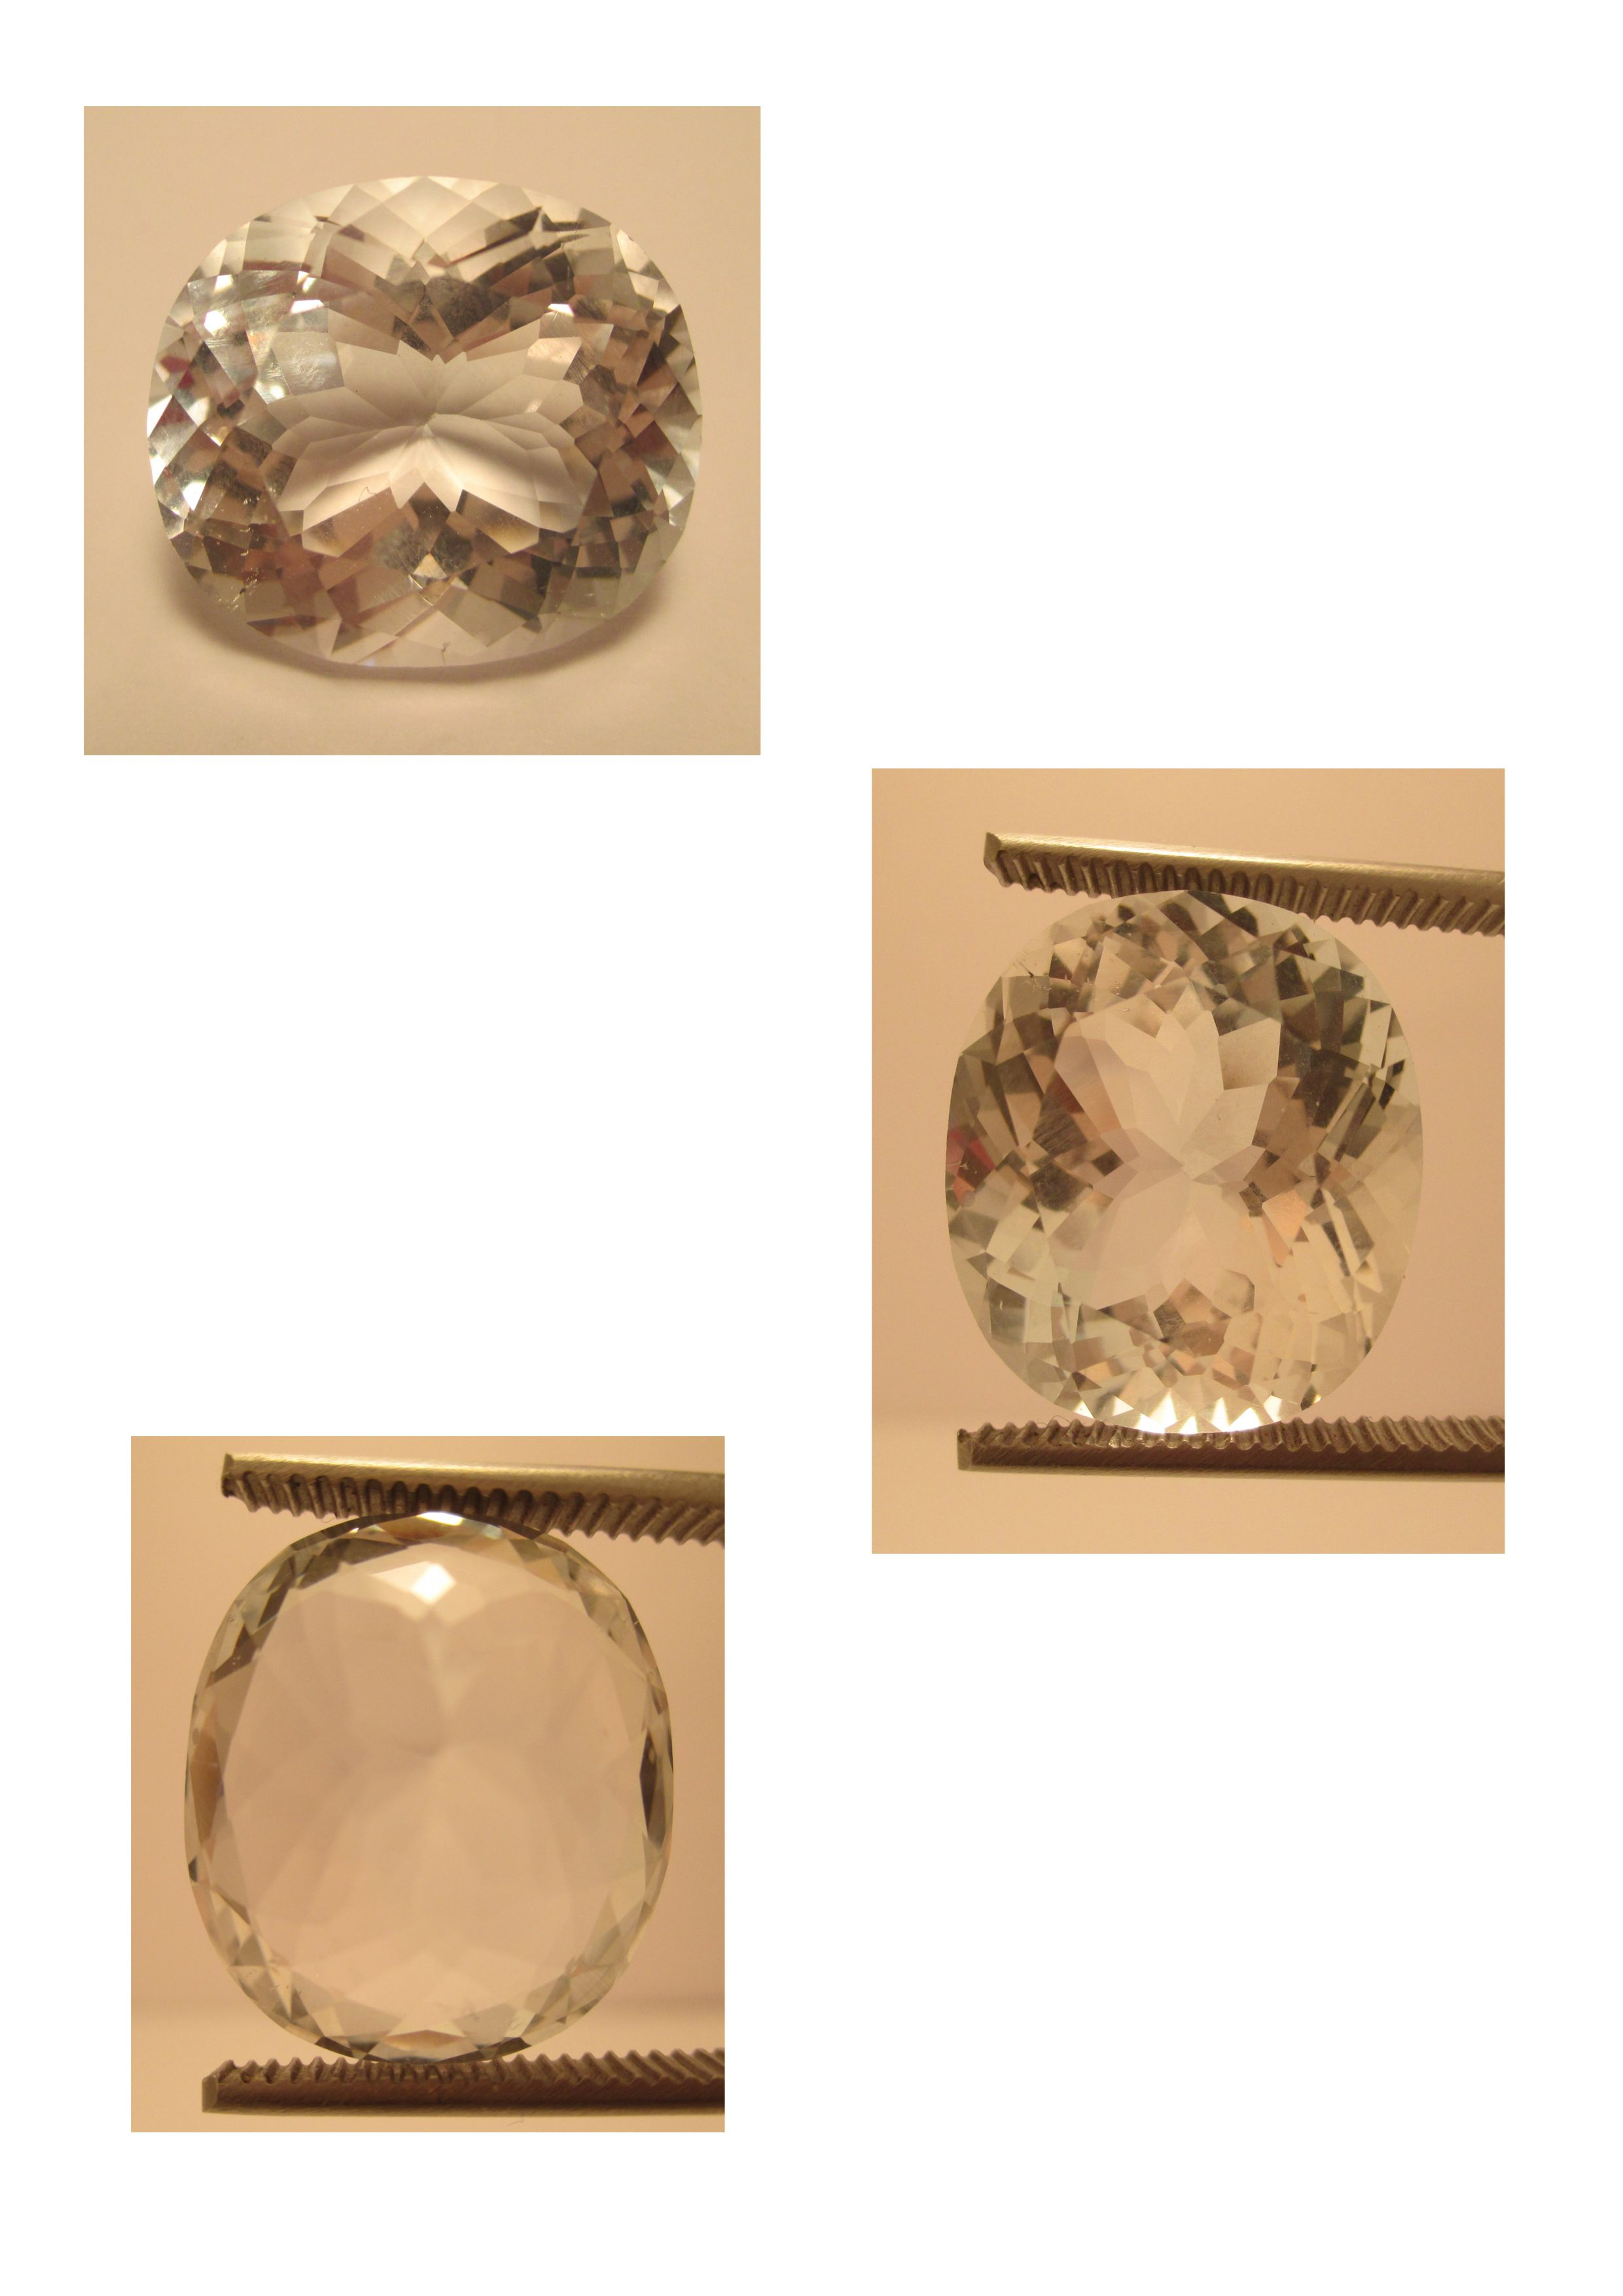 White Topas 30,95 ct, 20 x 17,5 x 12 mm - www.kn-jewellery.com - email: kn-jewellery@email.de